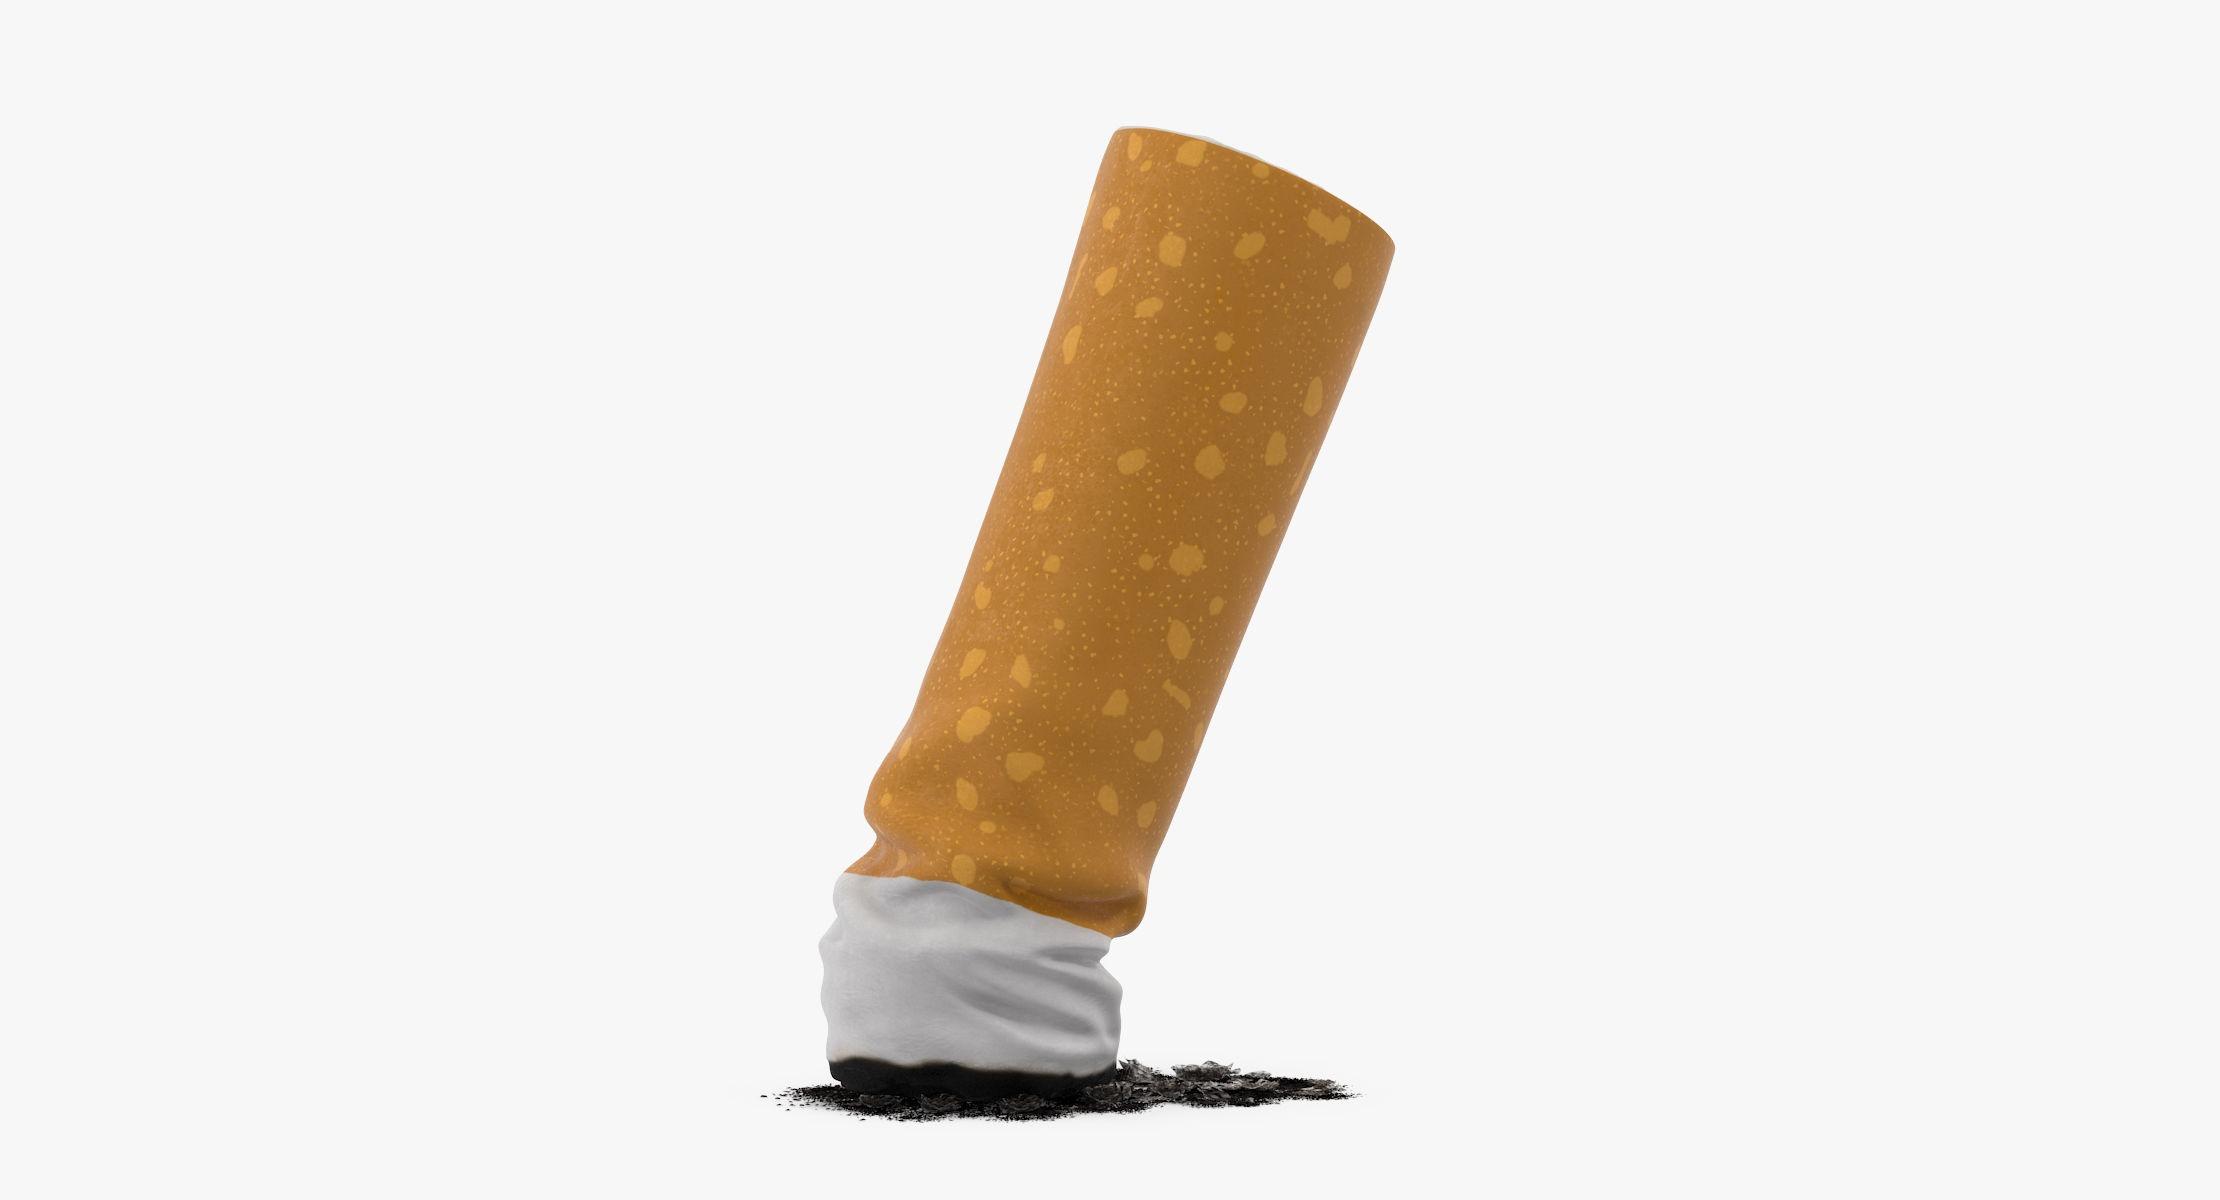 Snuffed Cigarette - reel 1